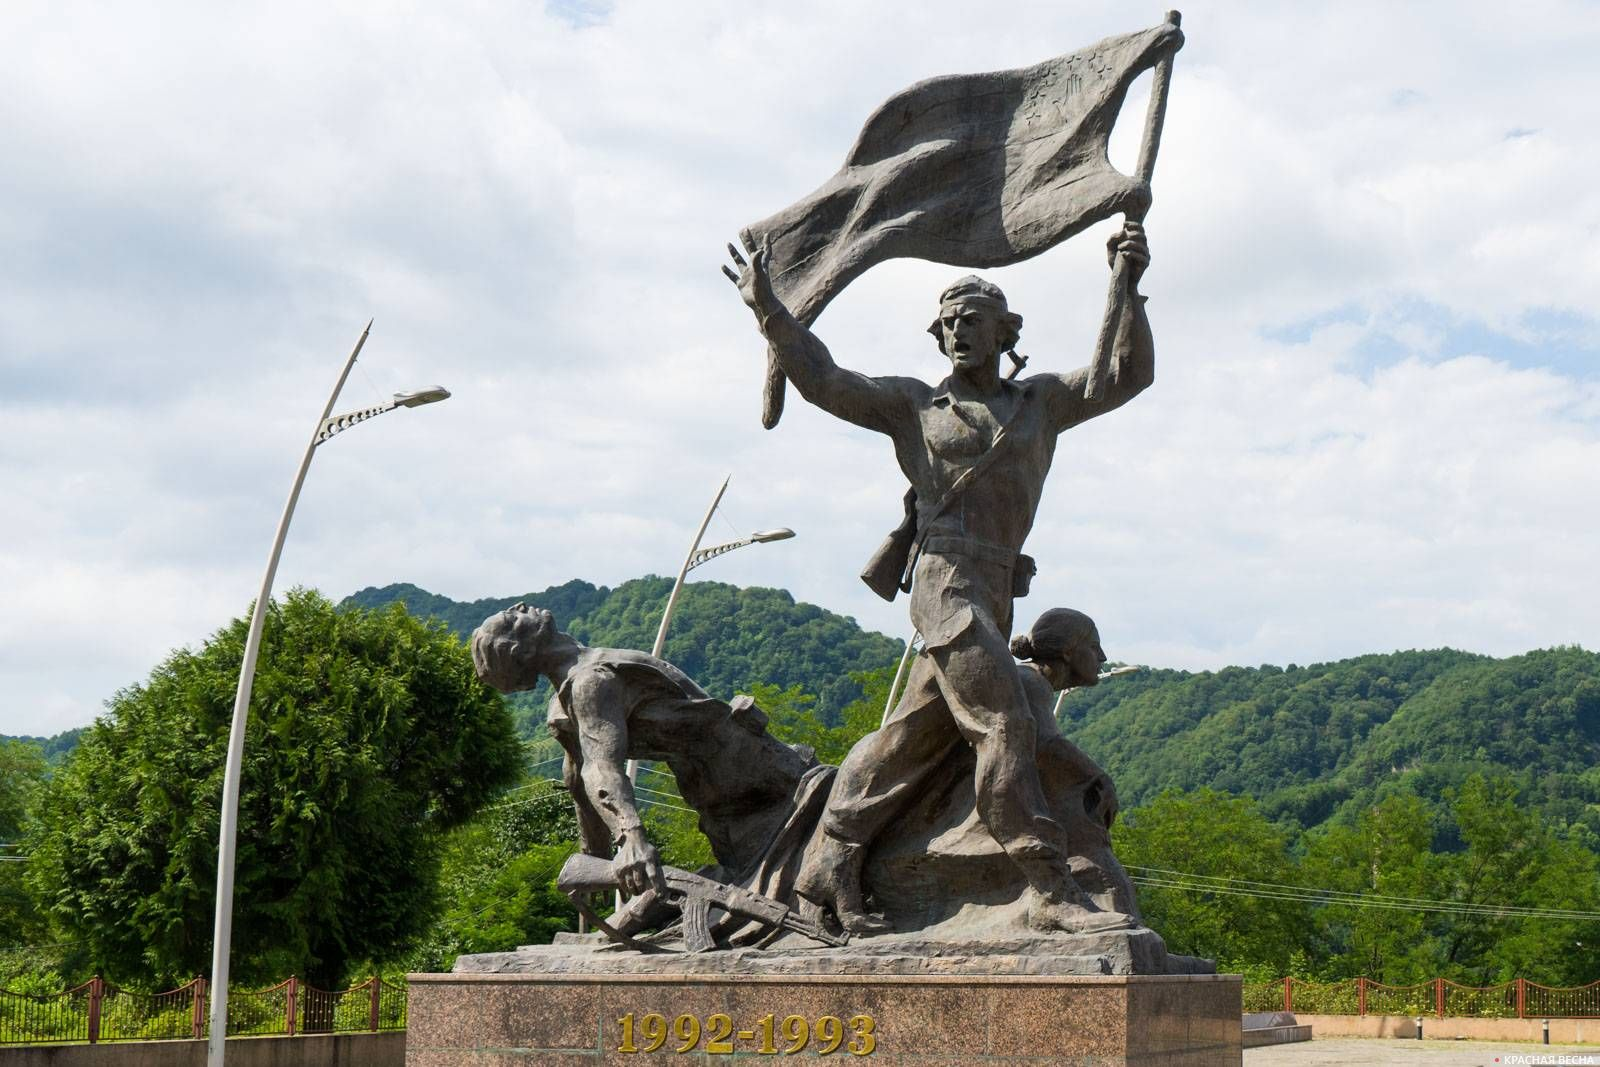 Мемориал защитникам Абхазии в войне 92–93 гг., г. Ткуарчал, Абхазия